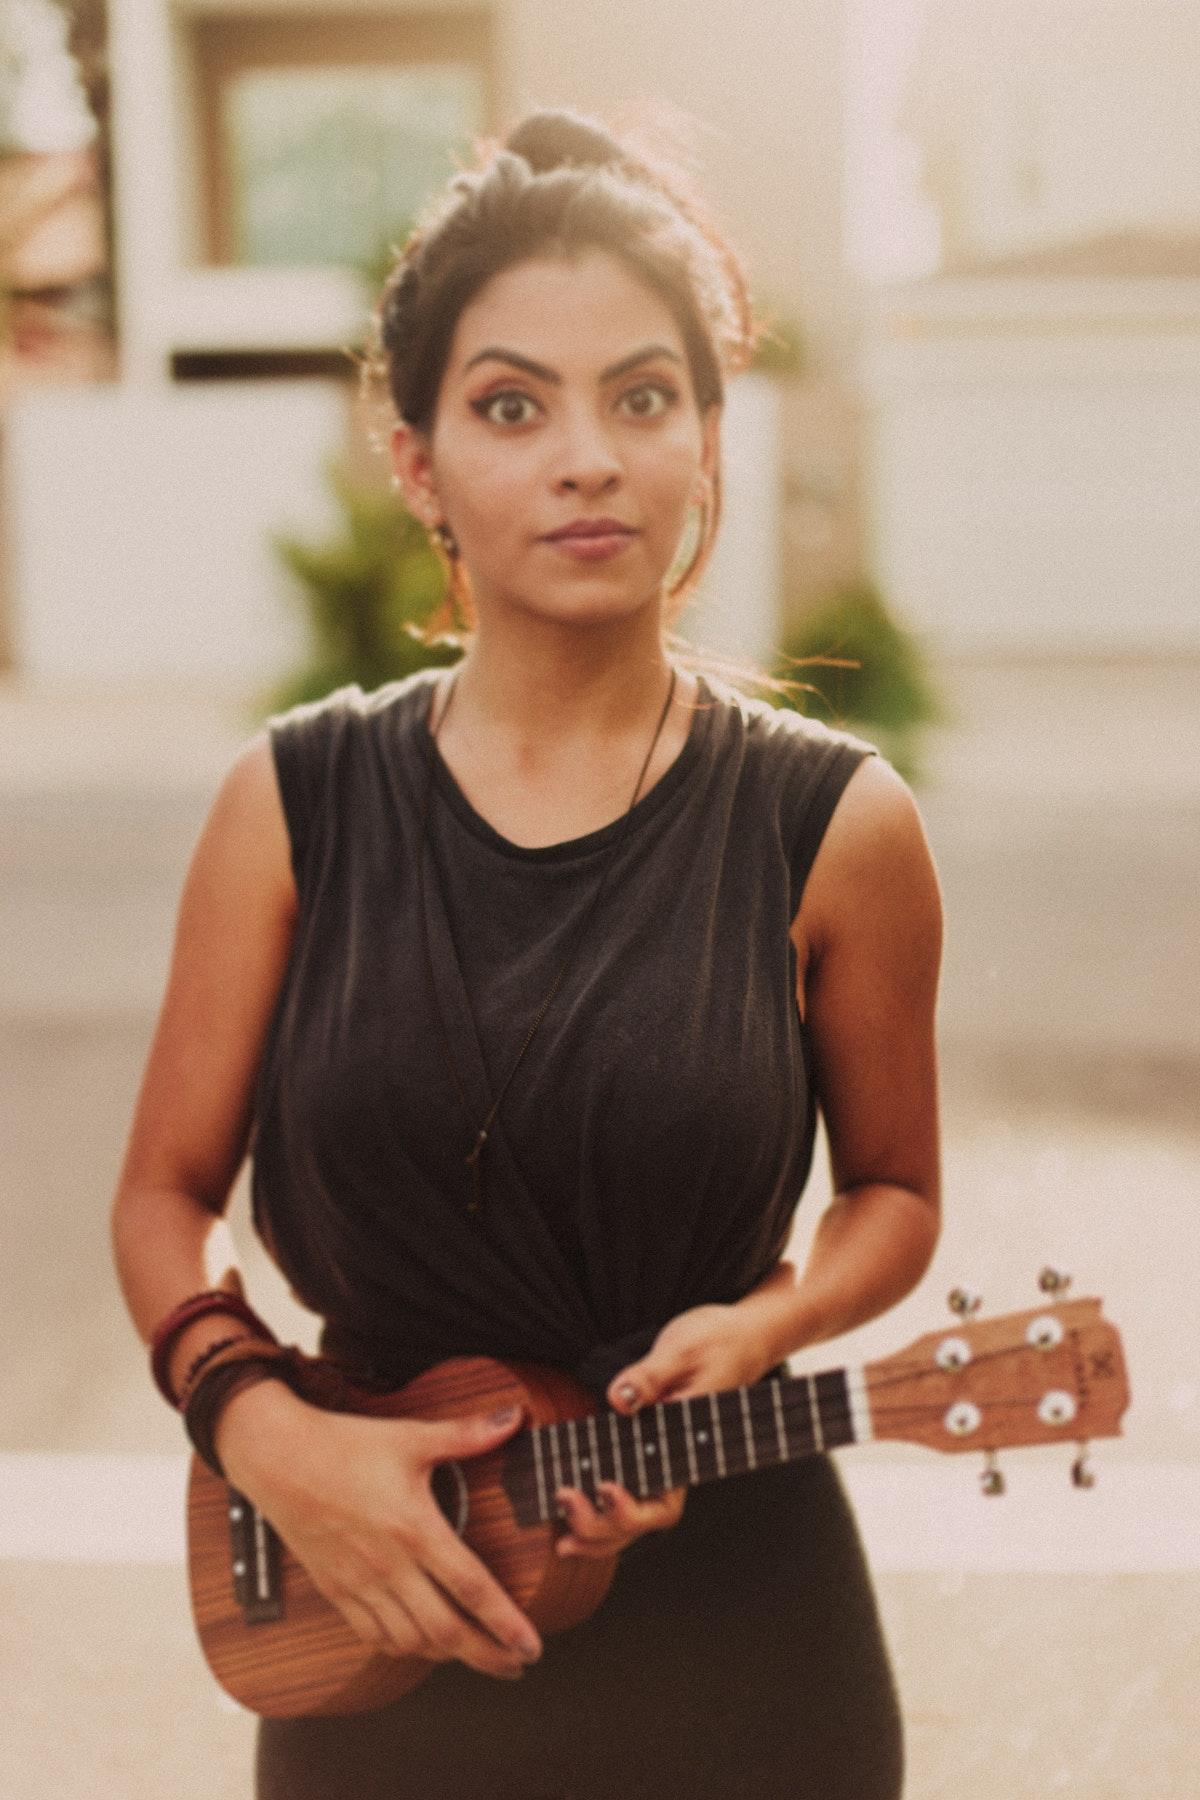 acoustic-guitar-adult-brazil-1045558.jpg